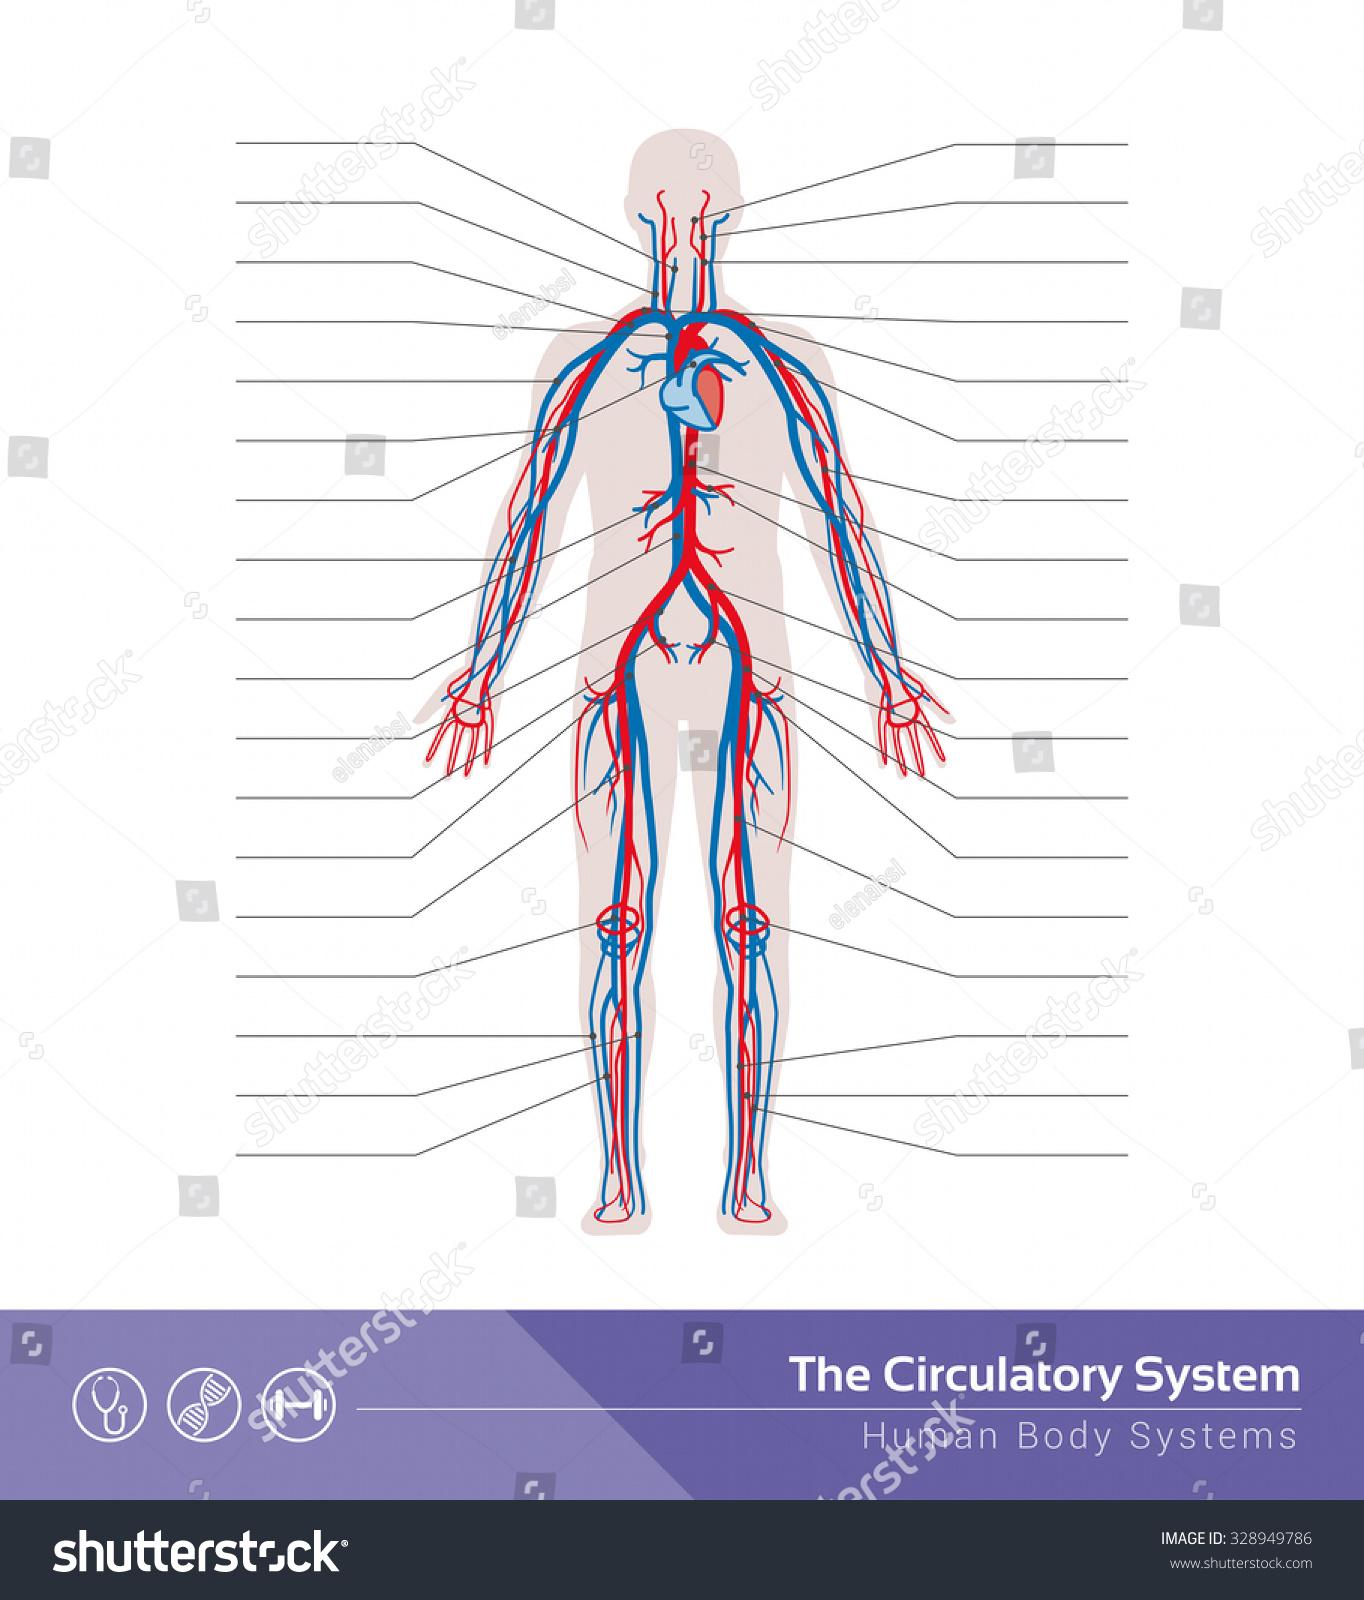 Circulatory Cardiovascular Human Body System Medical Vector de stock ...